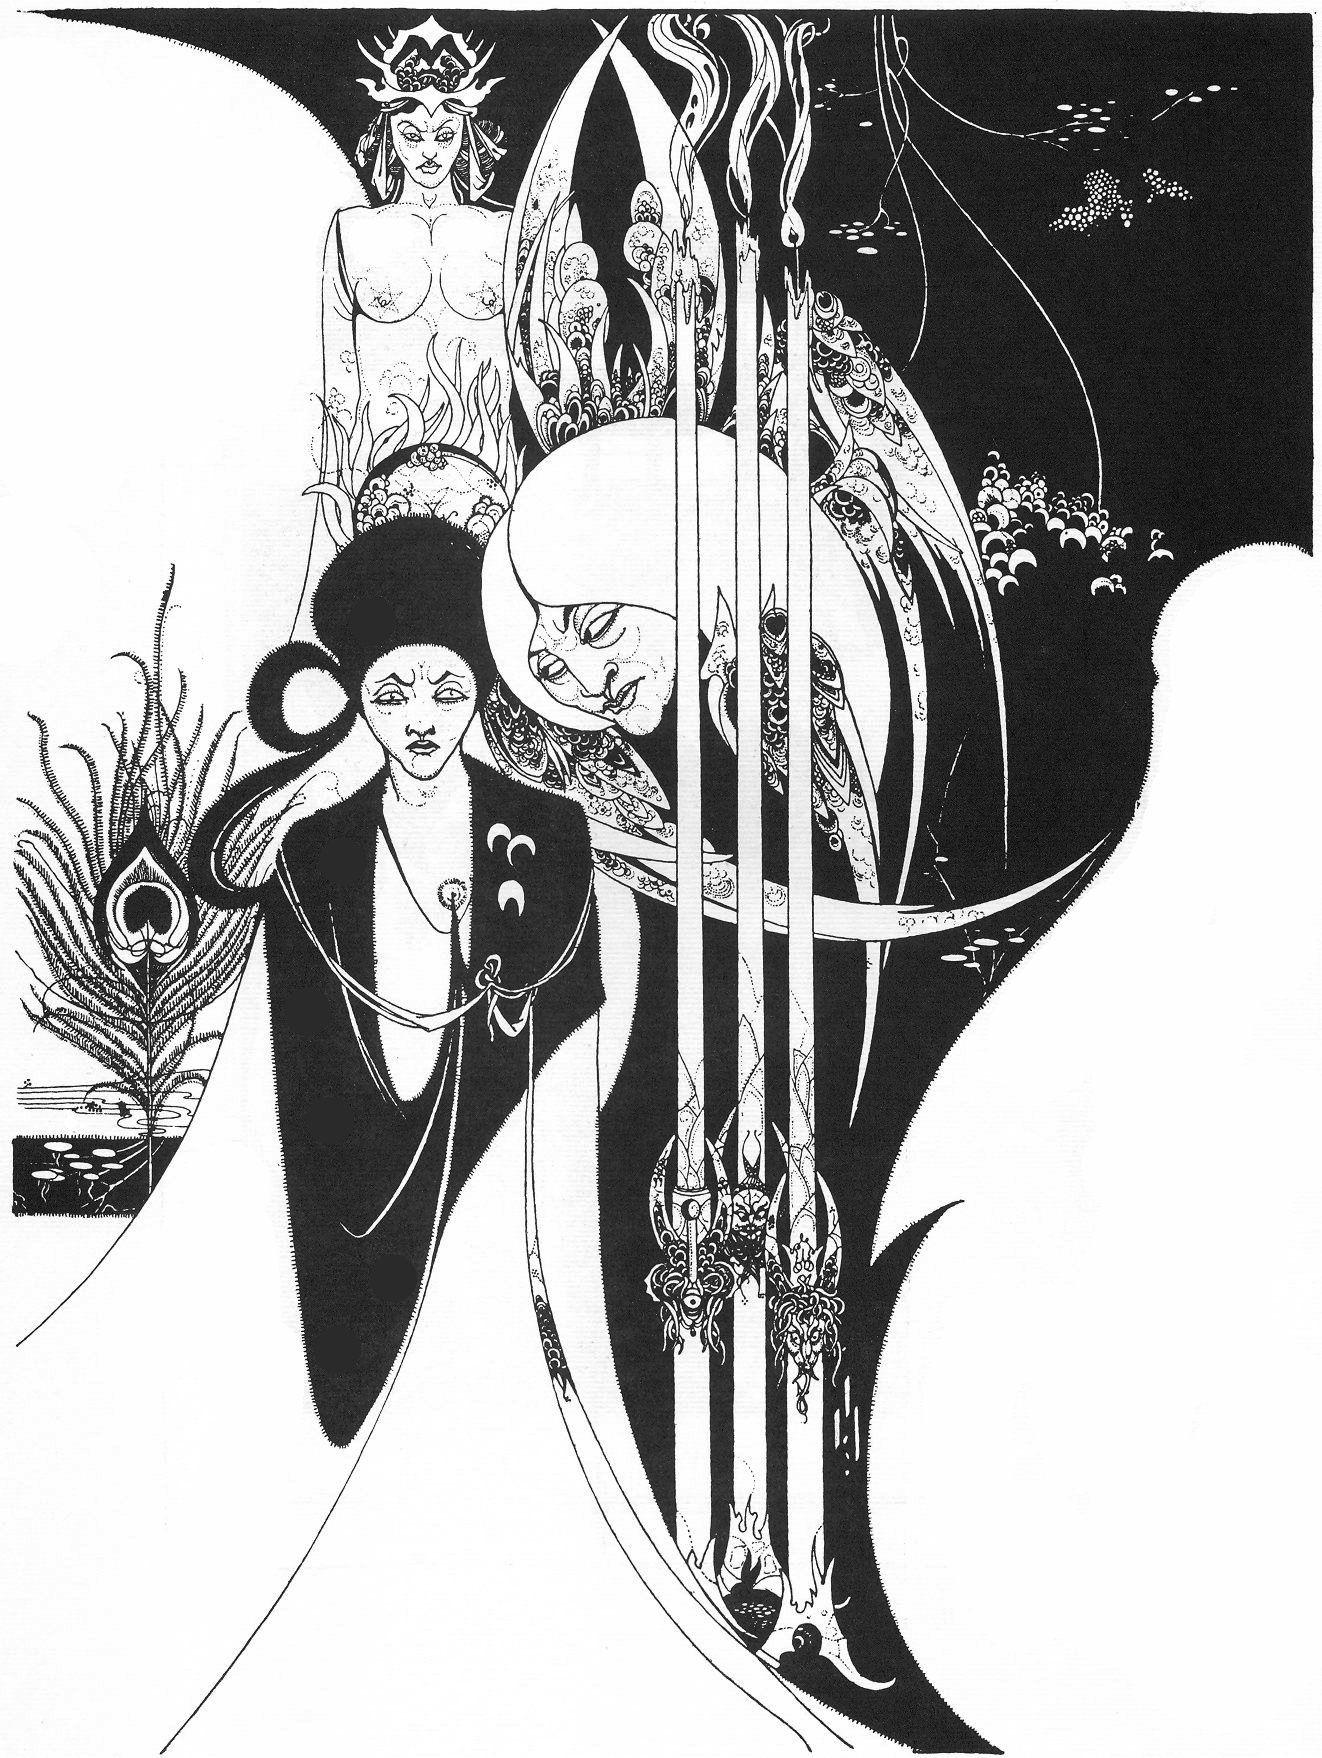 Project 5: Art Nouveau Style Classic Book Cover Inspiration (Aubrey Beardsley)